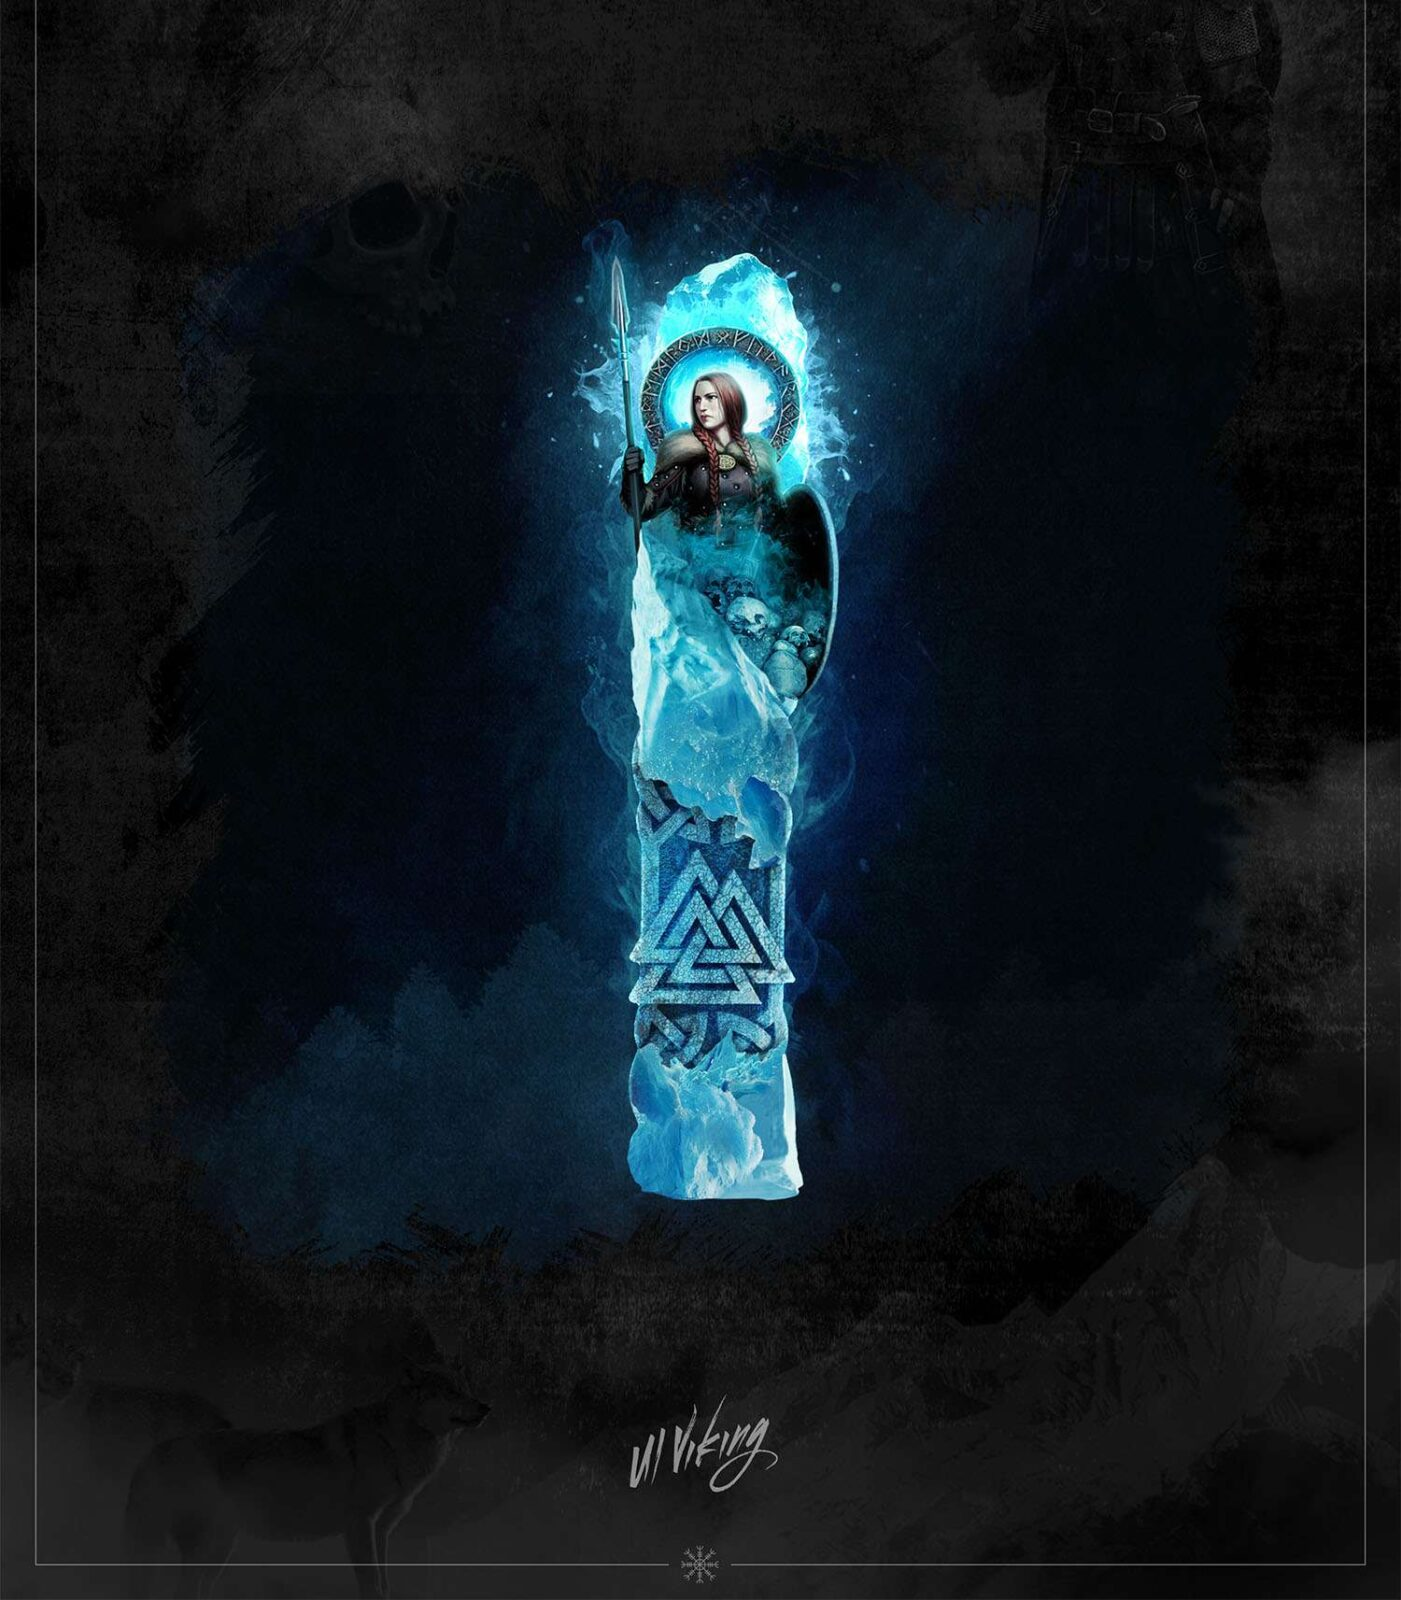 isaz rune, isaz, mythology, runes, norse runes, rune, viking, pagans, alex borisson, runes art, runes cards, cards, norse, valhalla, odin